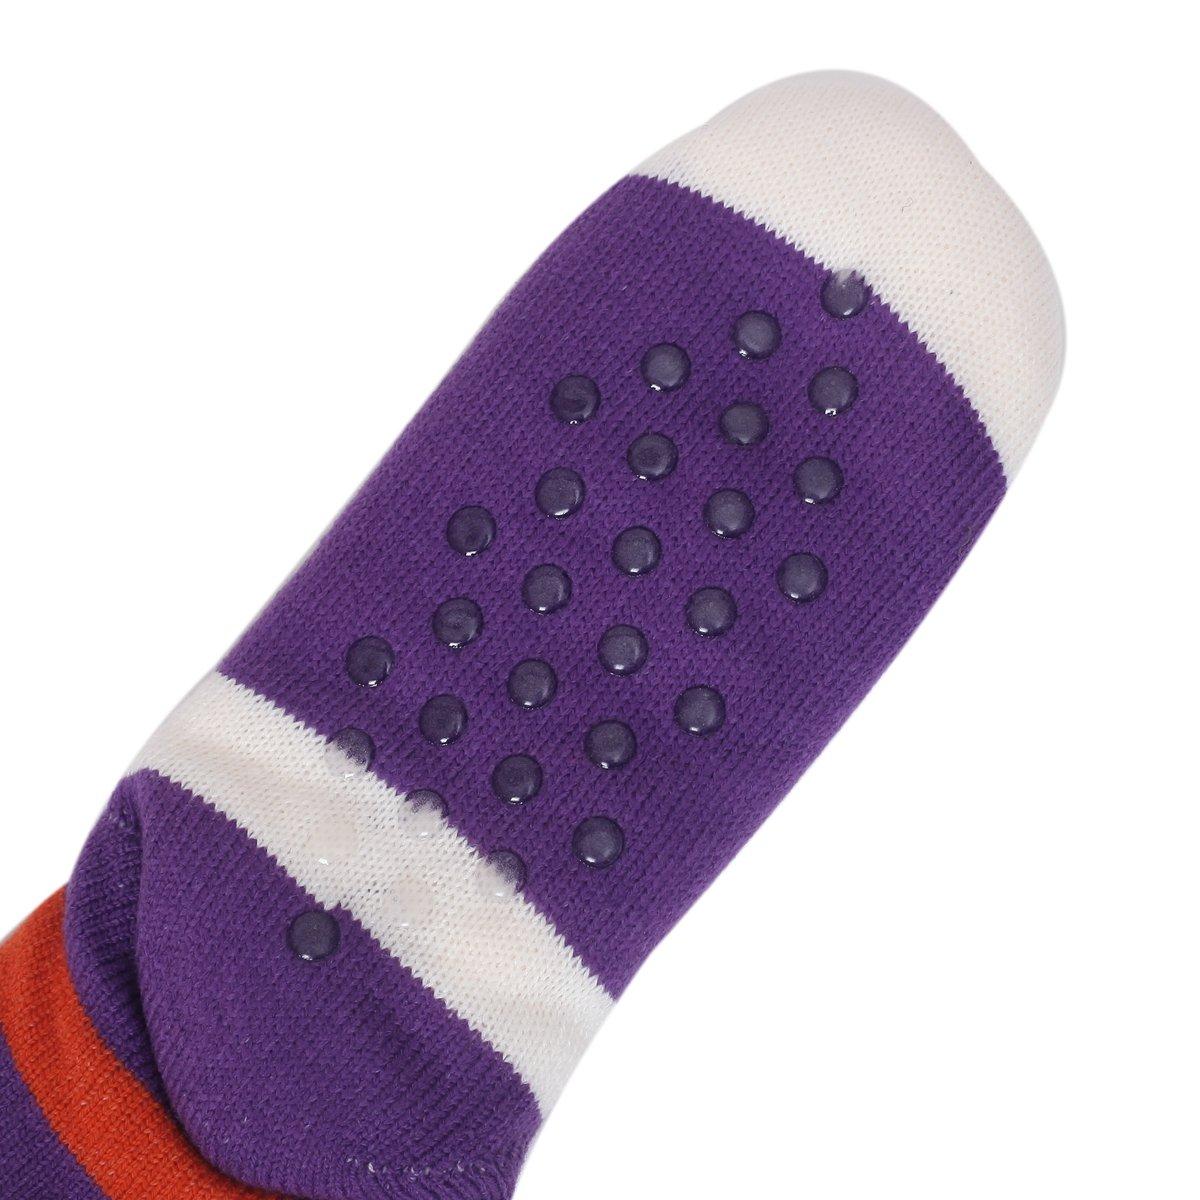 Eedor Womens Winter Soft Warm Fuzzy Slipper Home Socks Casual